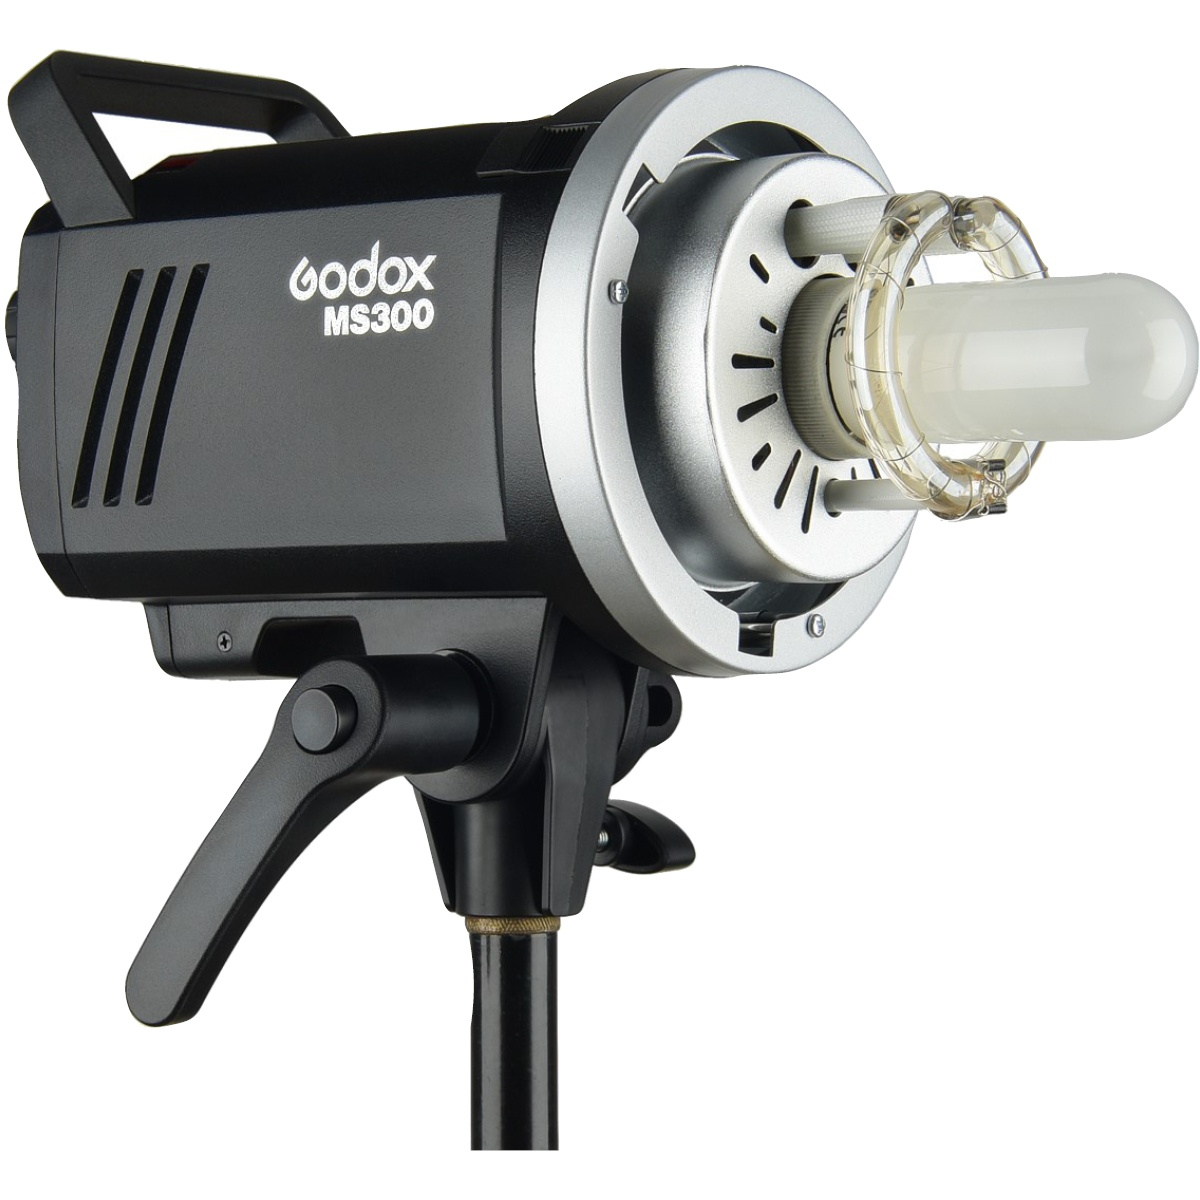 Godox MS300 Studioblitz